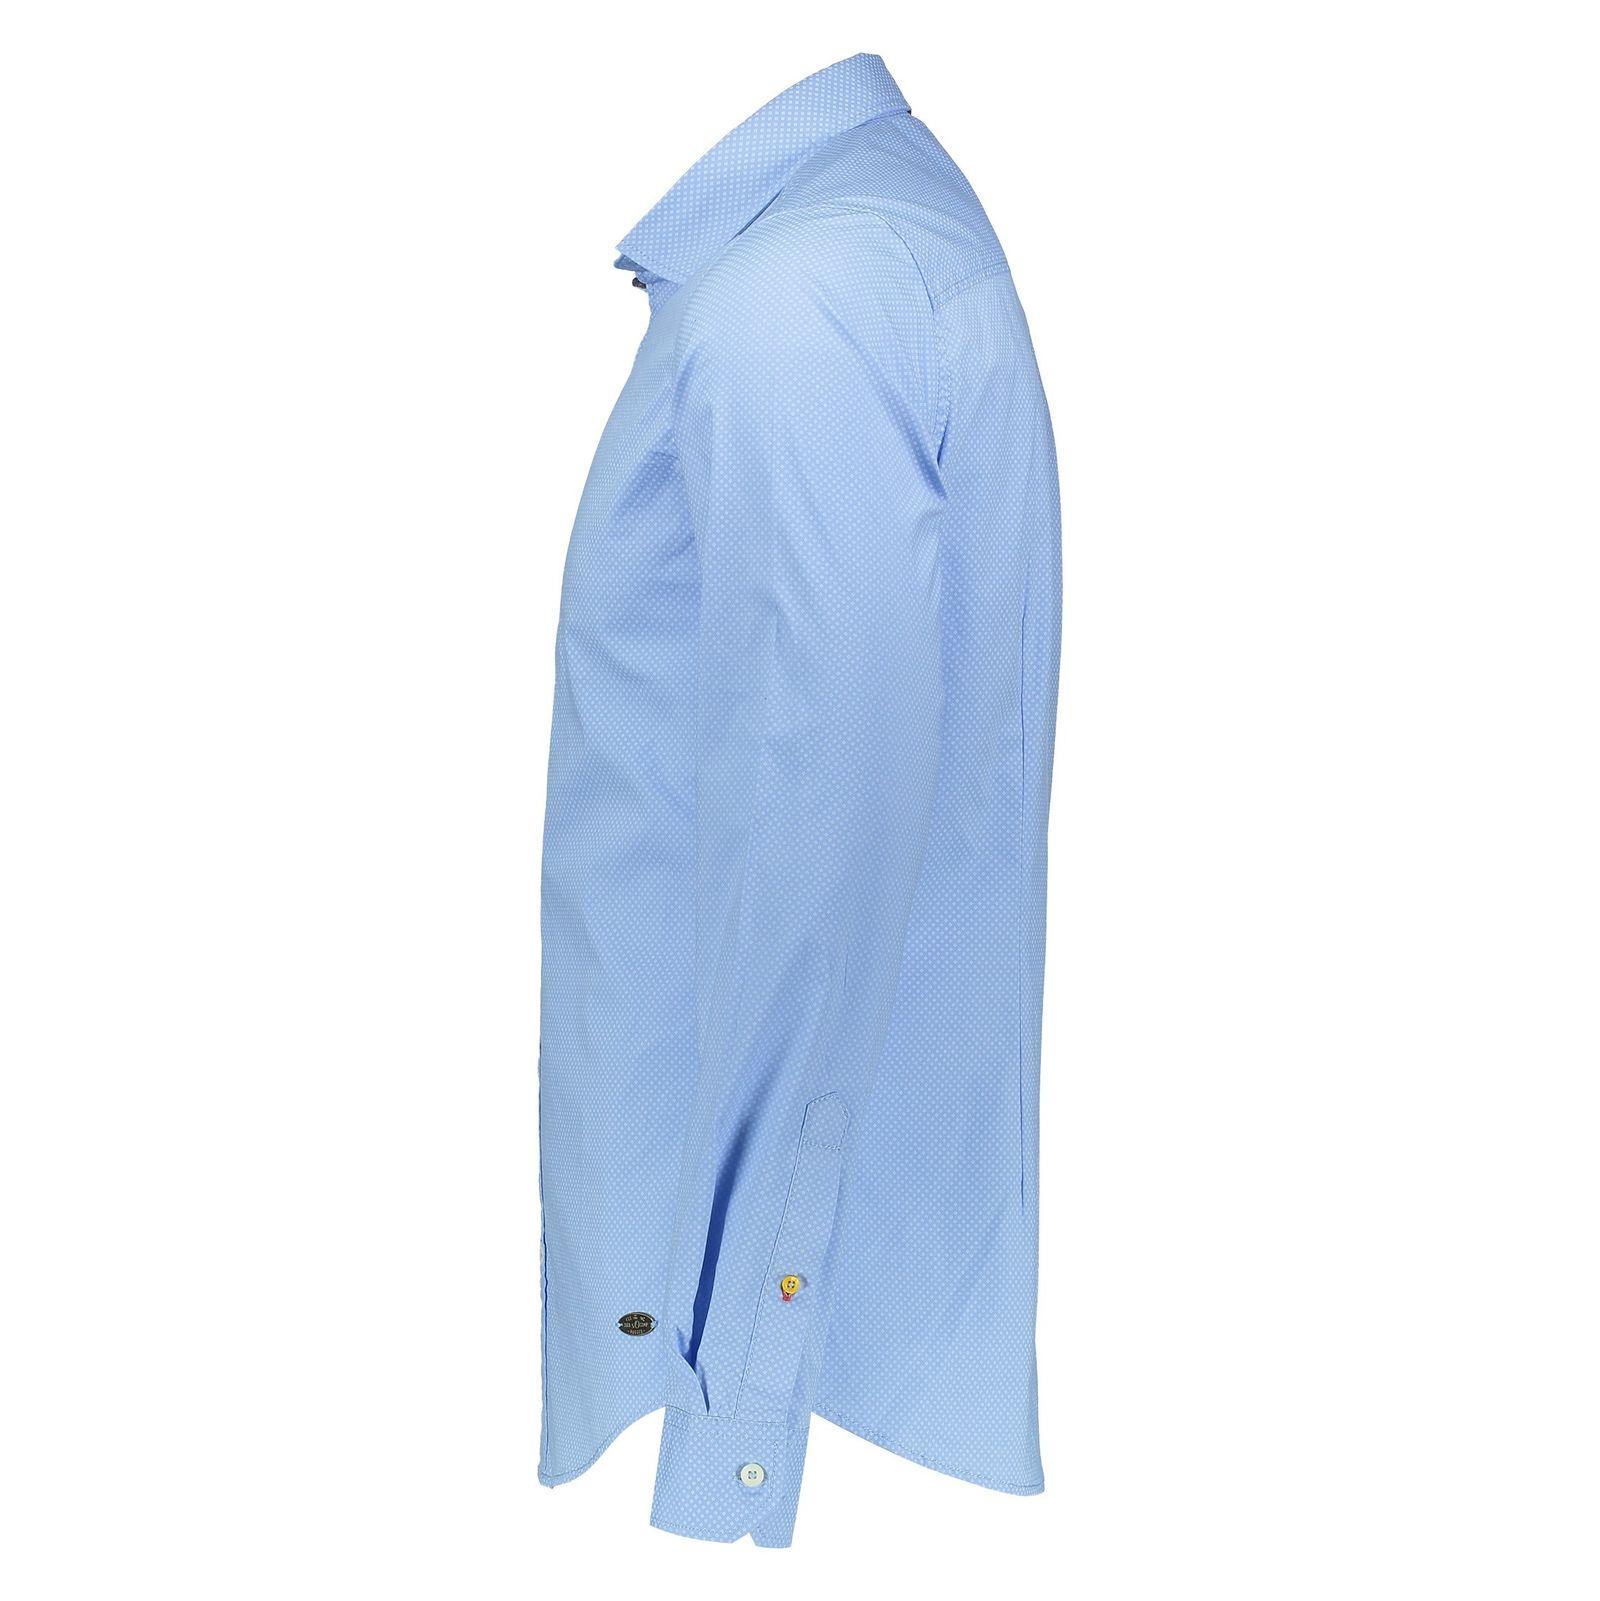 پیراهن نخی آستین بلند مردانه - اس.اولیور - آبي روشن - 3